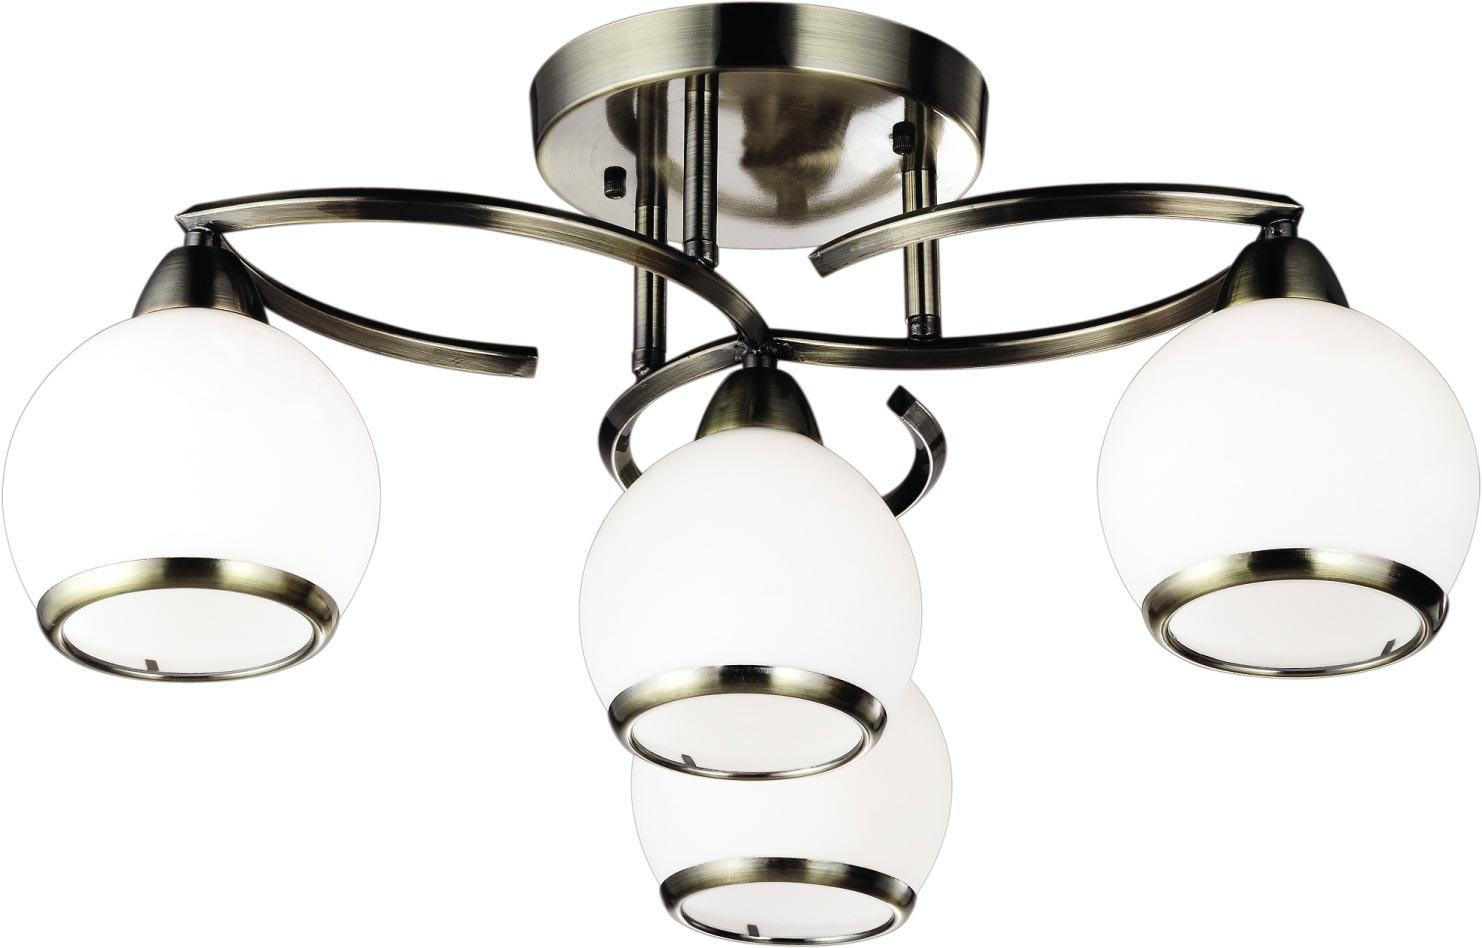 Lampa sufitowa K-JSL-6084/4 AB z serii LARA